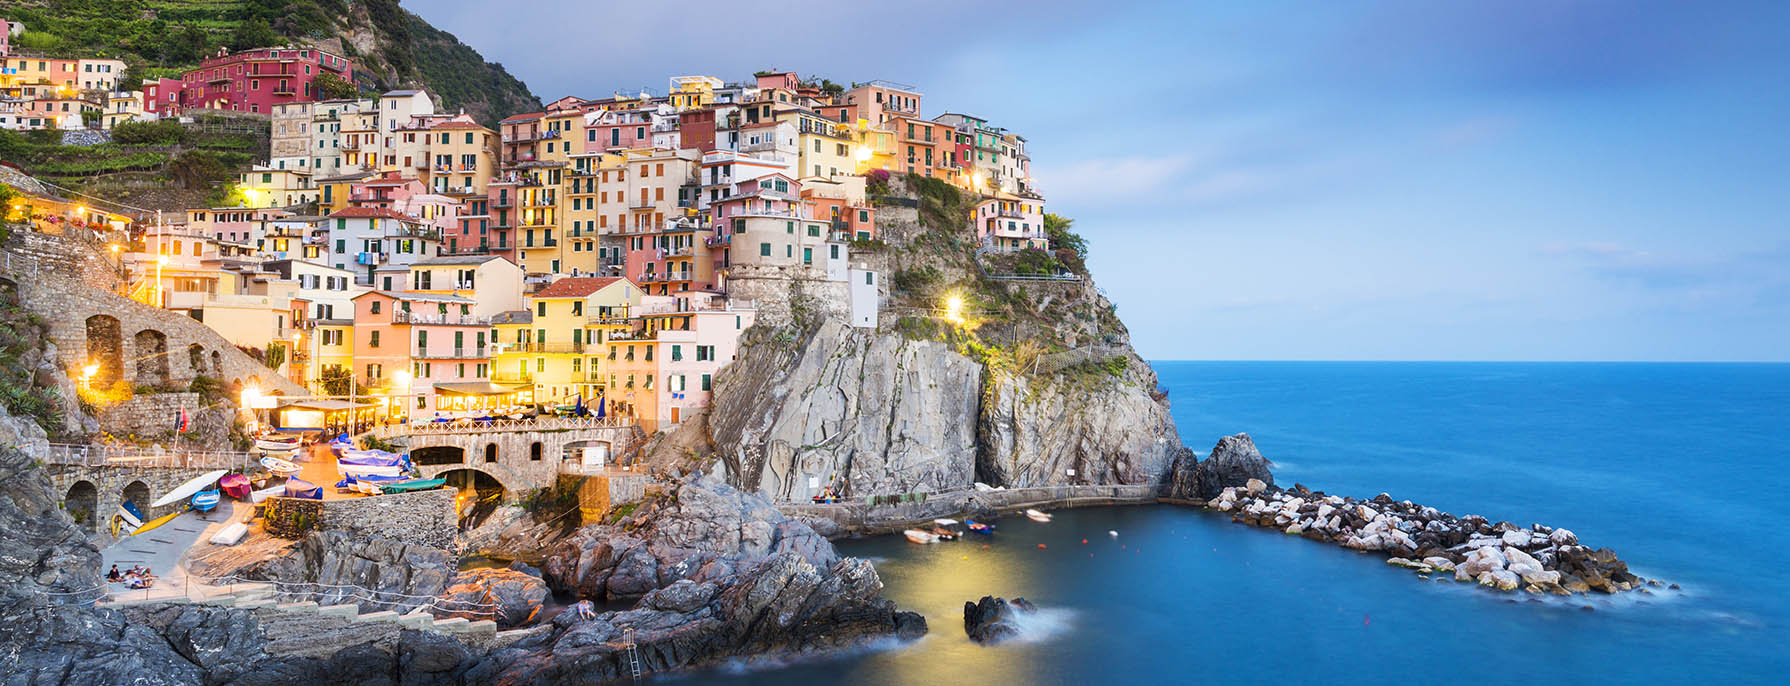 SEO Workshops for Landscape & Adventure Photographers